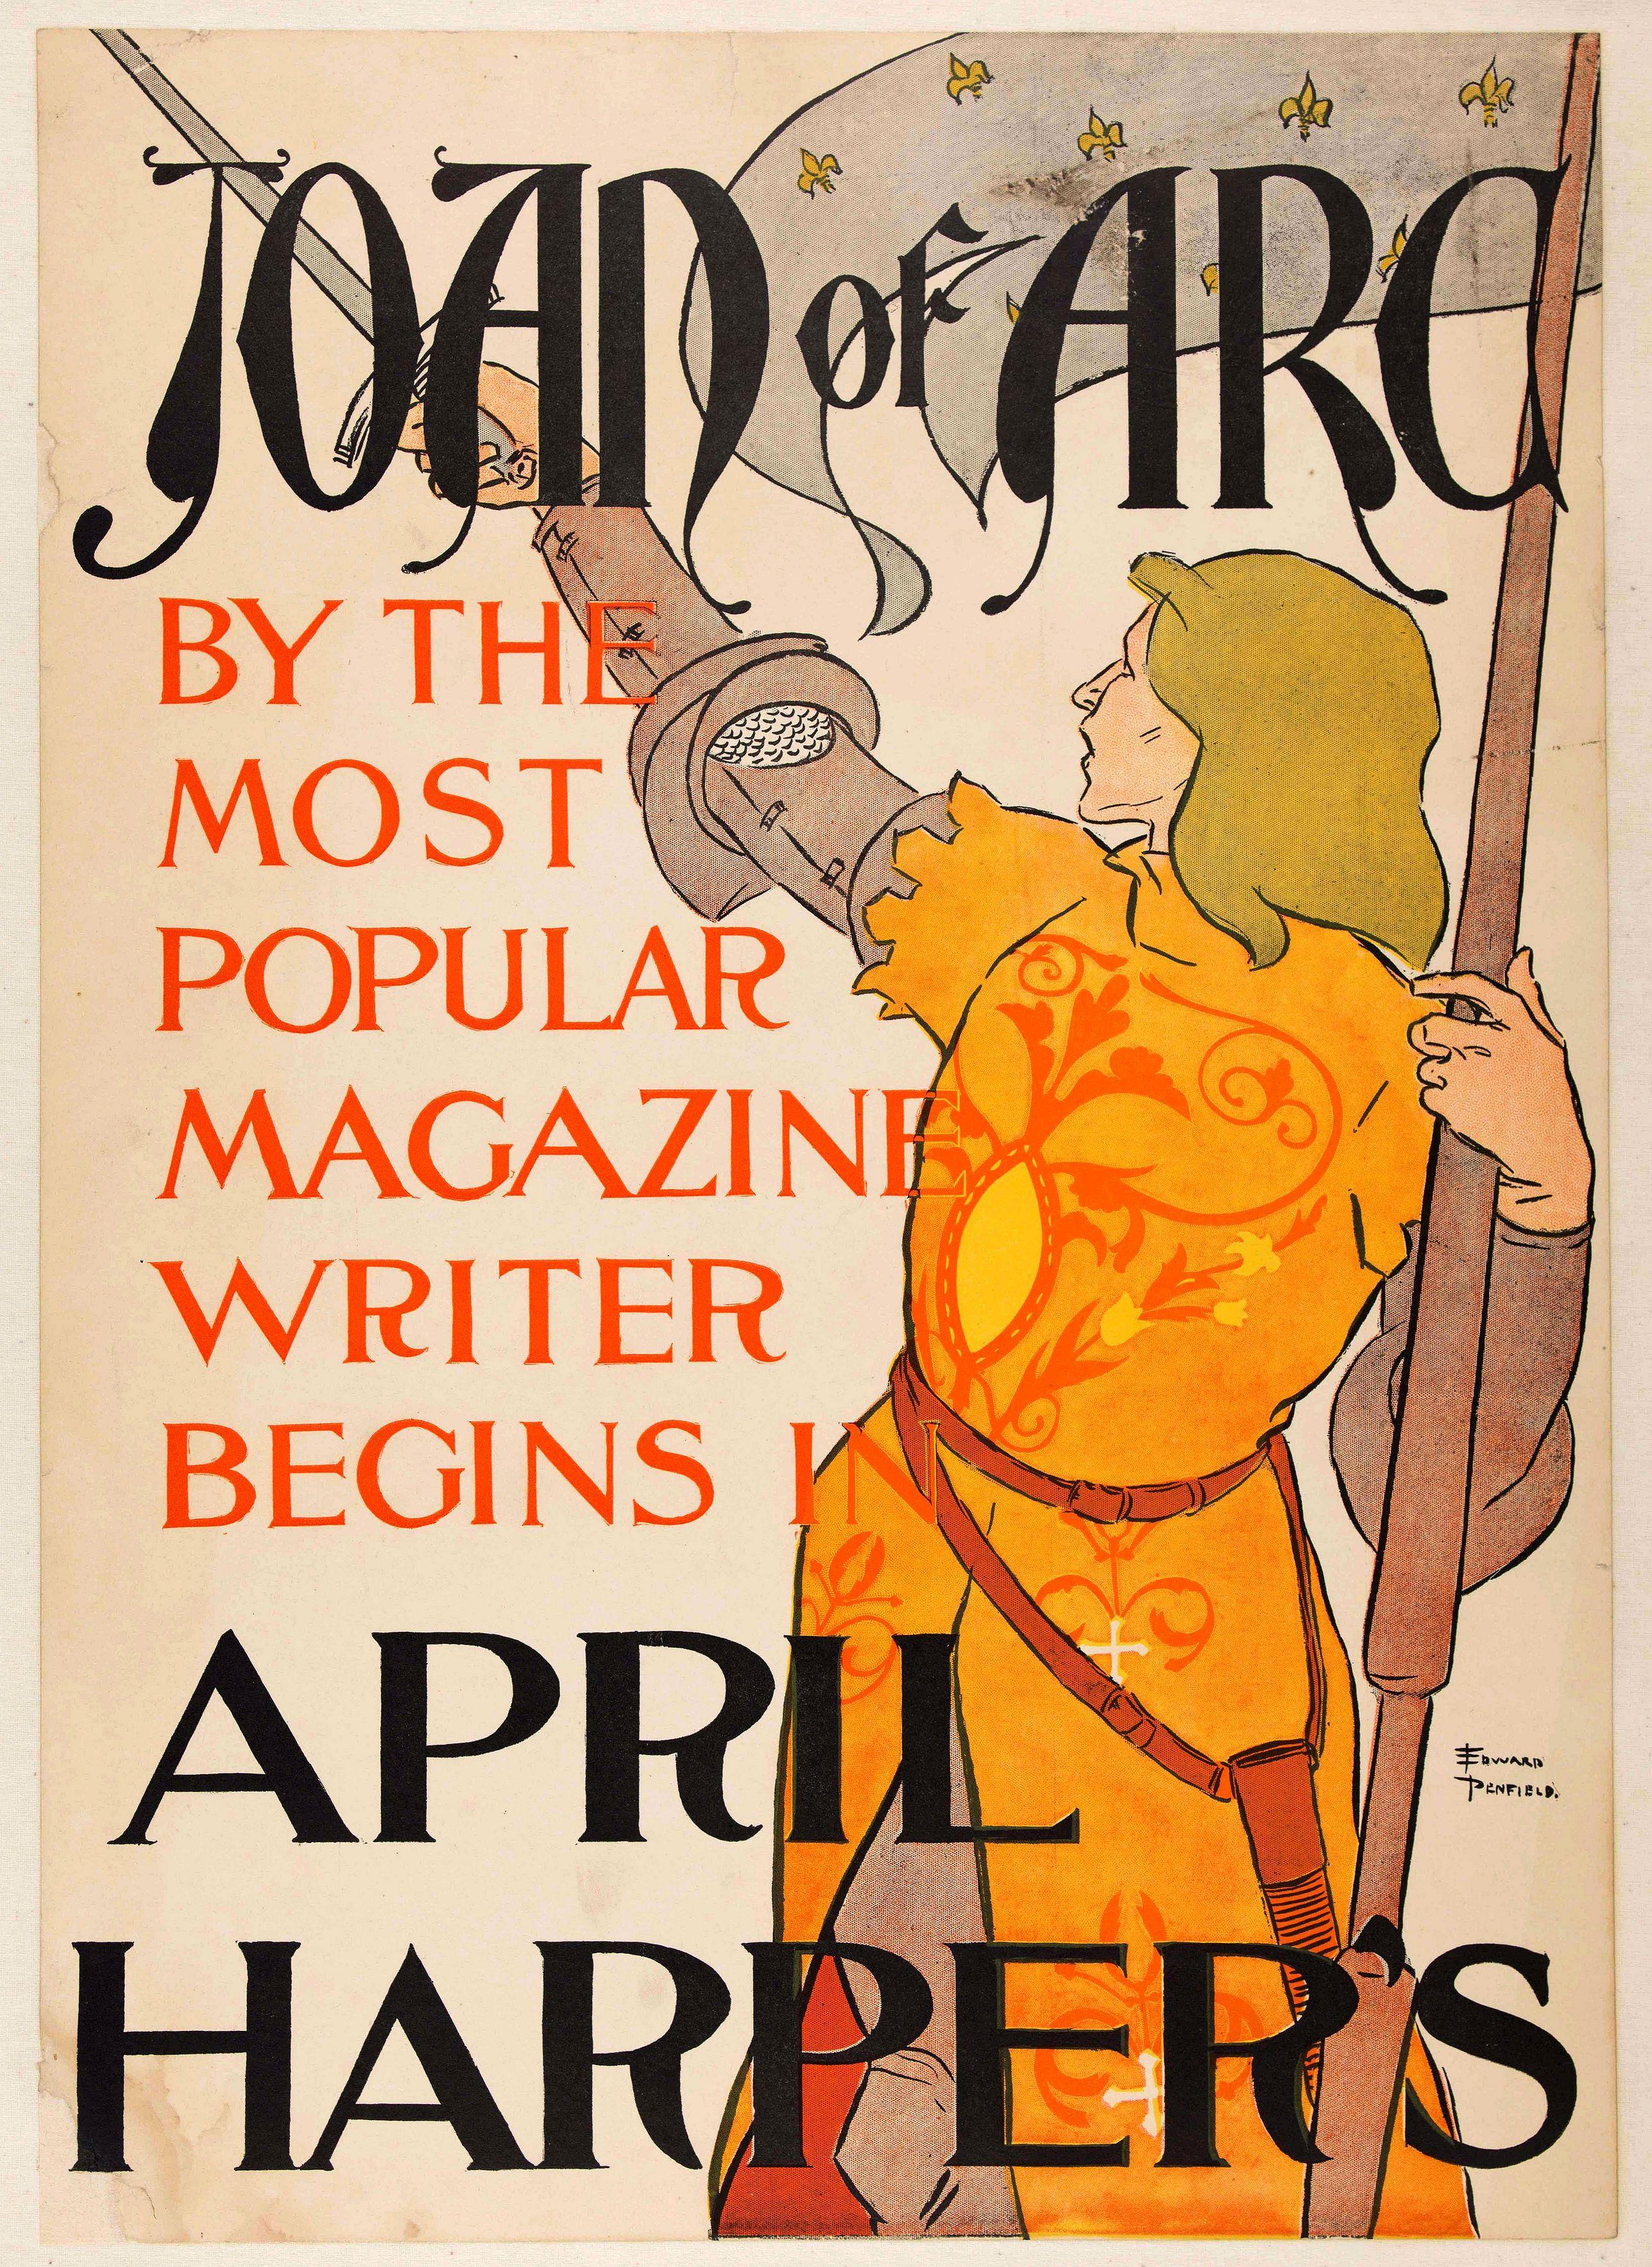 PENFIELD, E. -  Joan of Arc […] April Harper's.